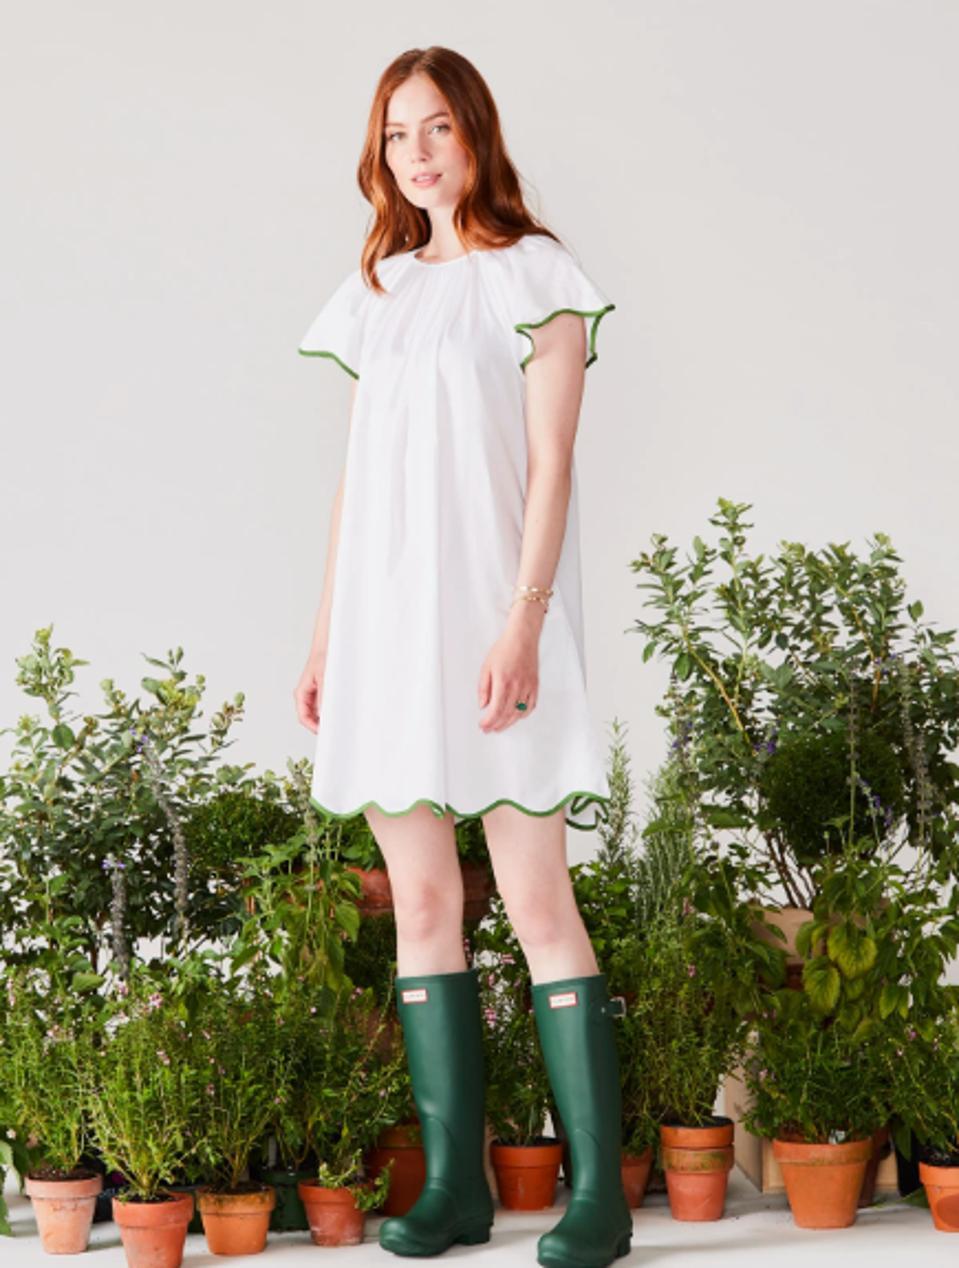 White Garden Dress by Lake Pajamas